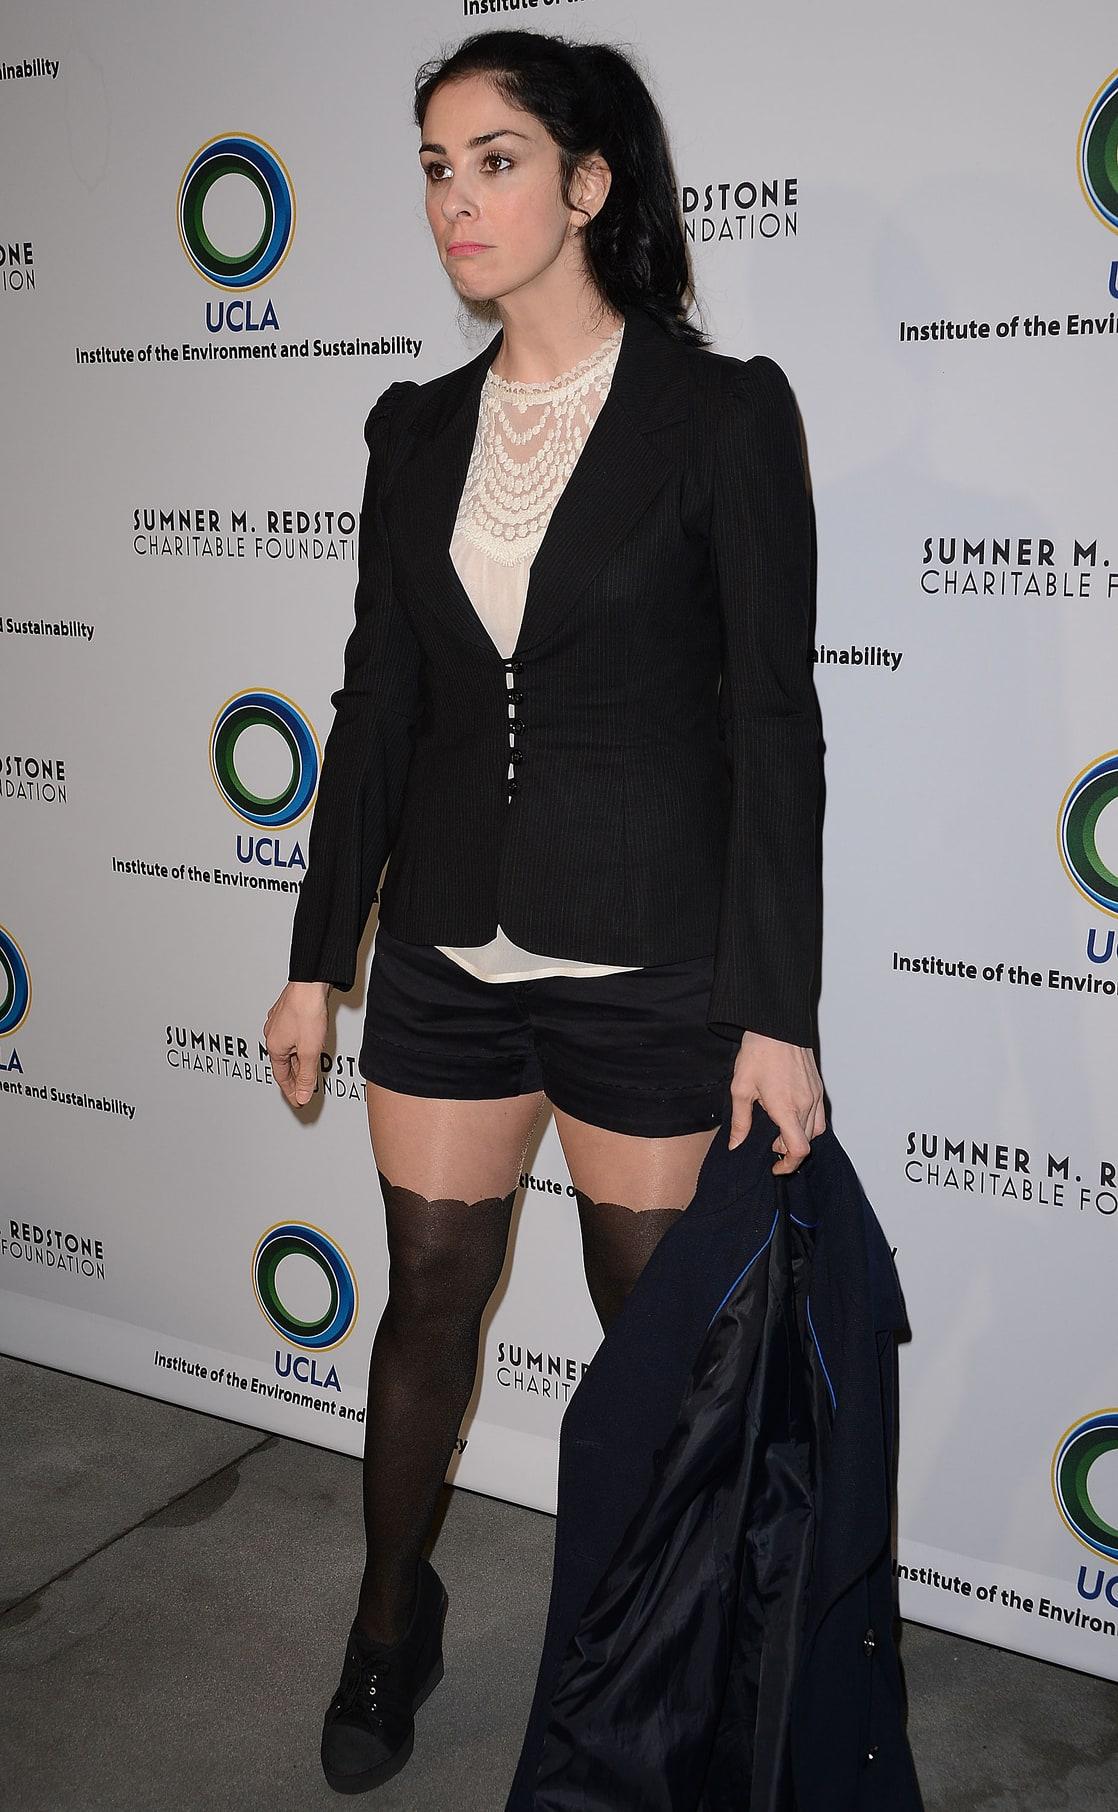 Topless pics of sabine jemeljanova 2,Kara del toro lingerie XXX archive Kaley Cuoco's Deleted Big Bang Theory Sex Scene,Bleona Qereti See Through. 2018-2019 celebrityes photos leaks!